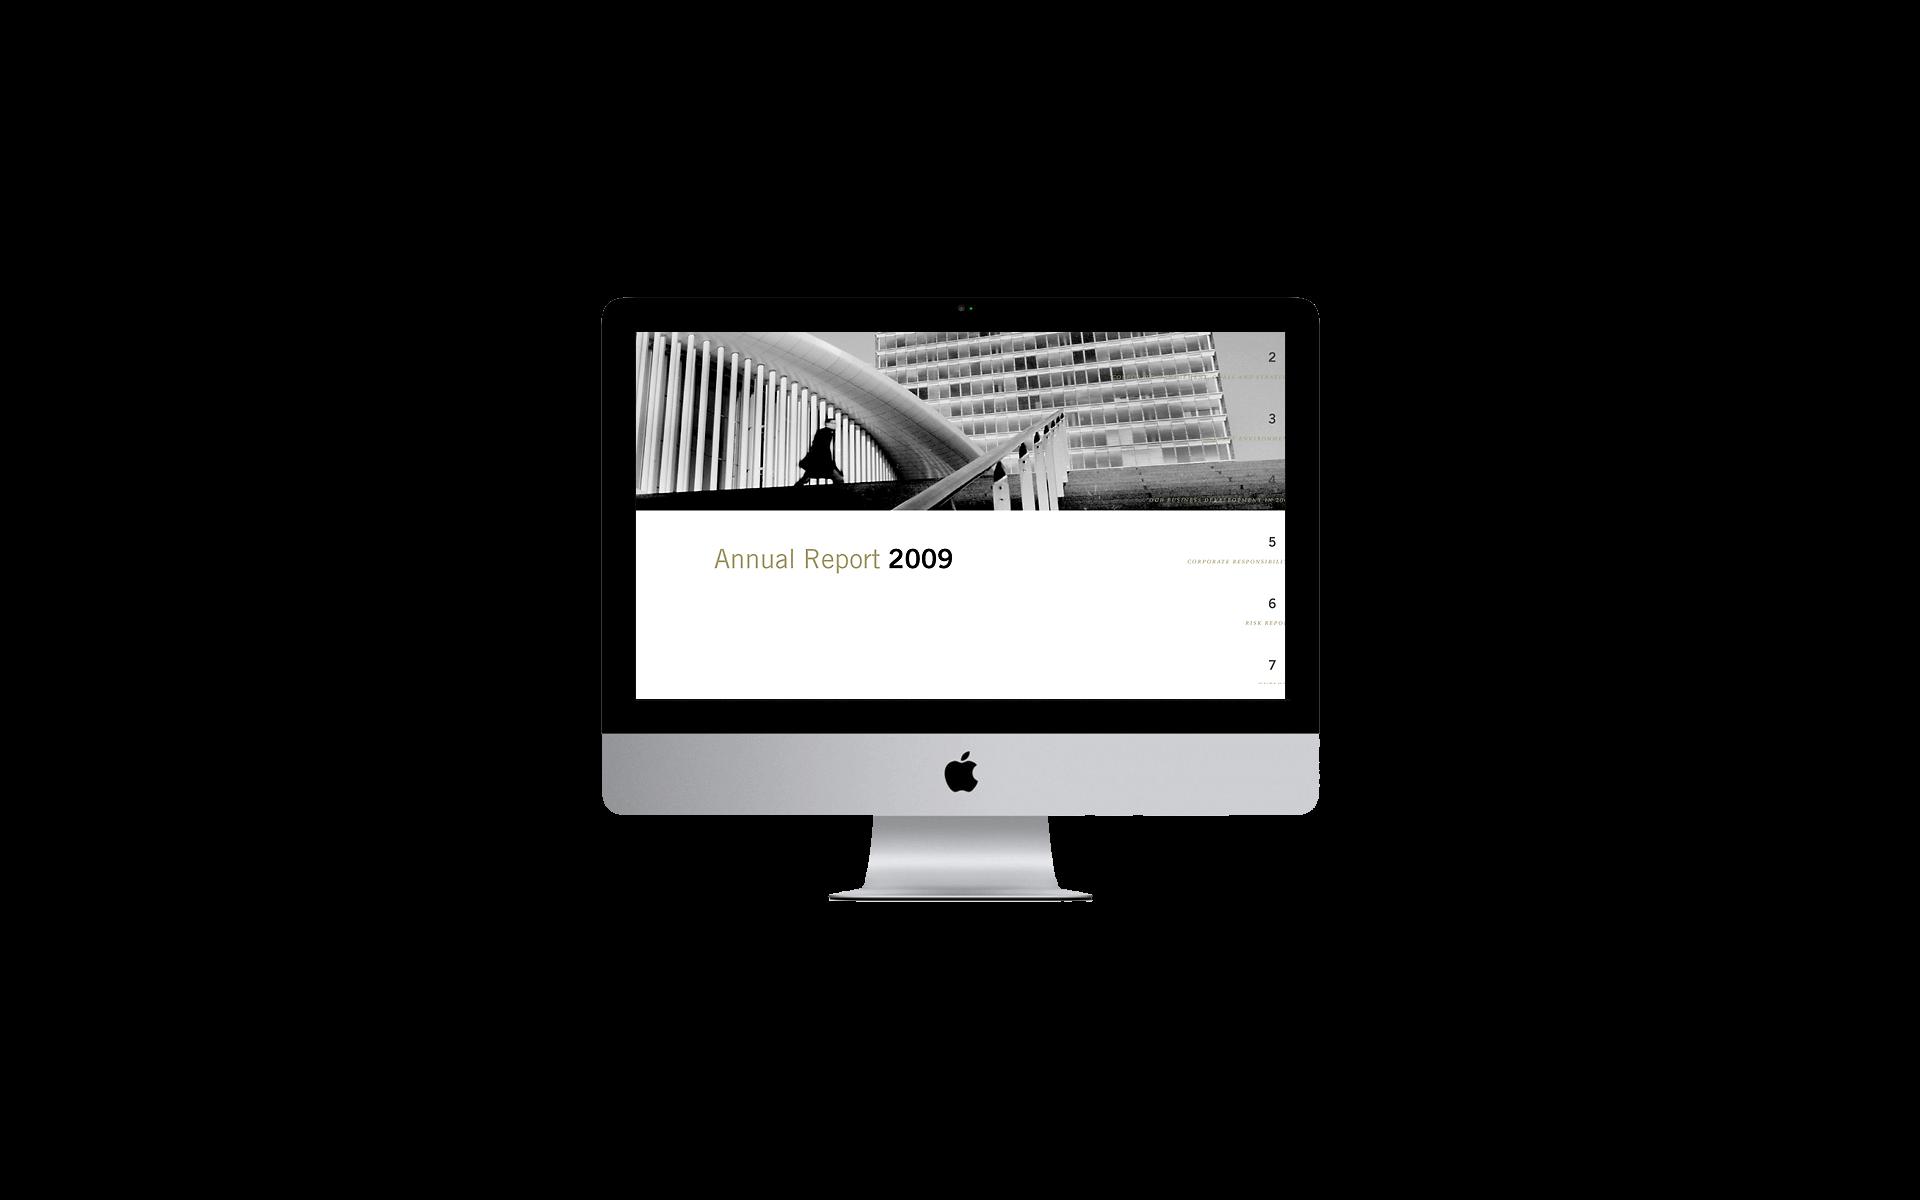 J. C. Flowers & Company, Online-Geschäftsbericht, NPG, 2009.